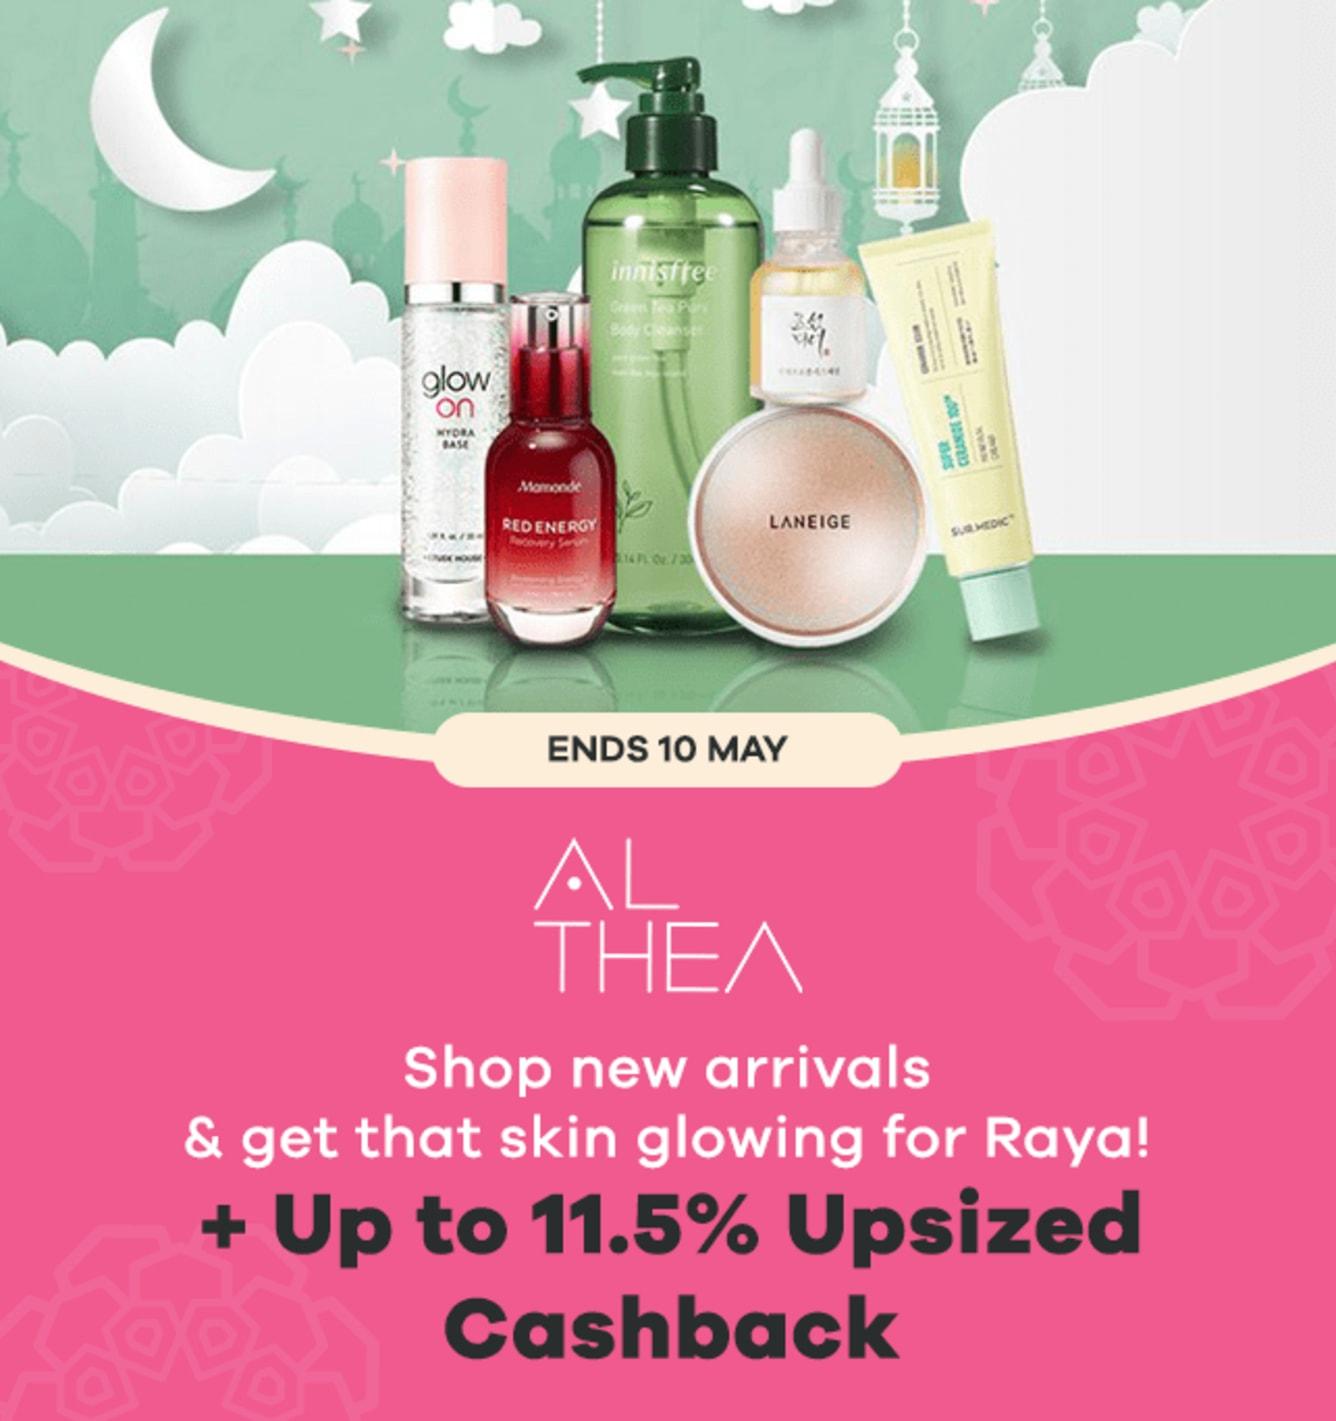 Althea Raya Deals + Up to 11.5% Upsized Cashback